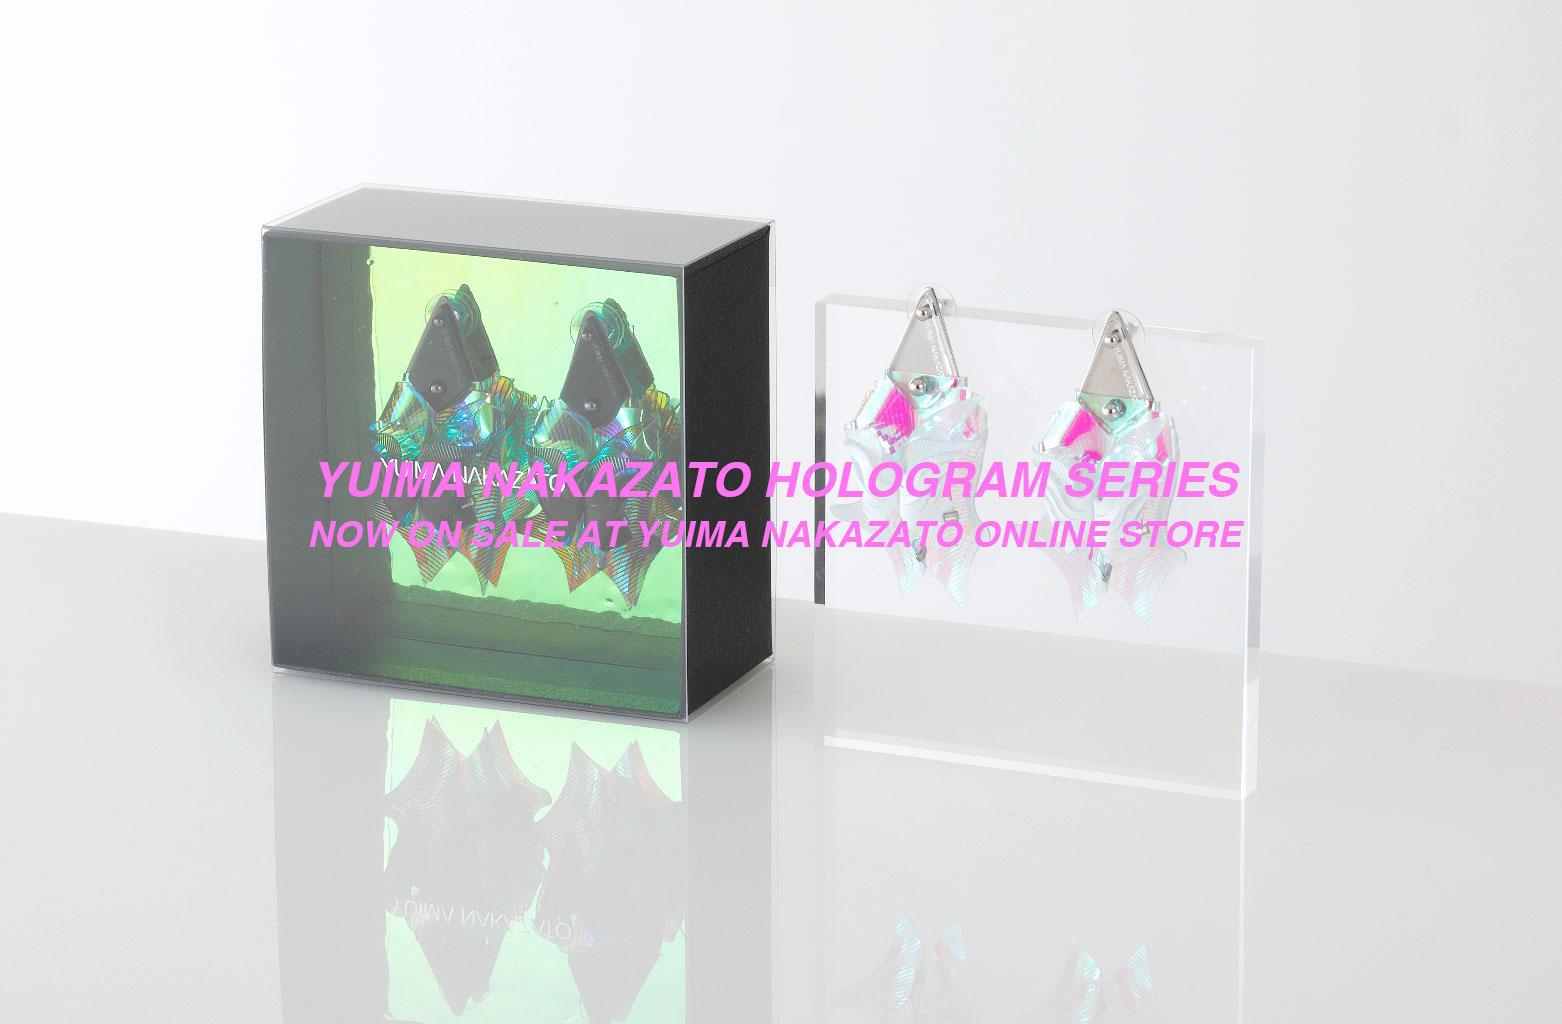 hologram series now on sale at yuima nakazato online store news